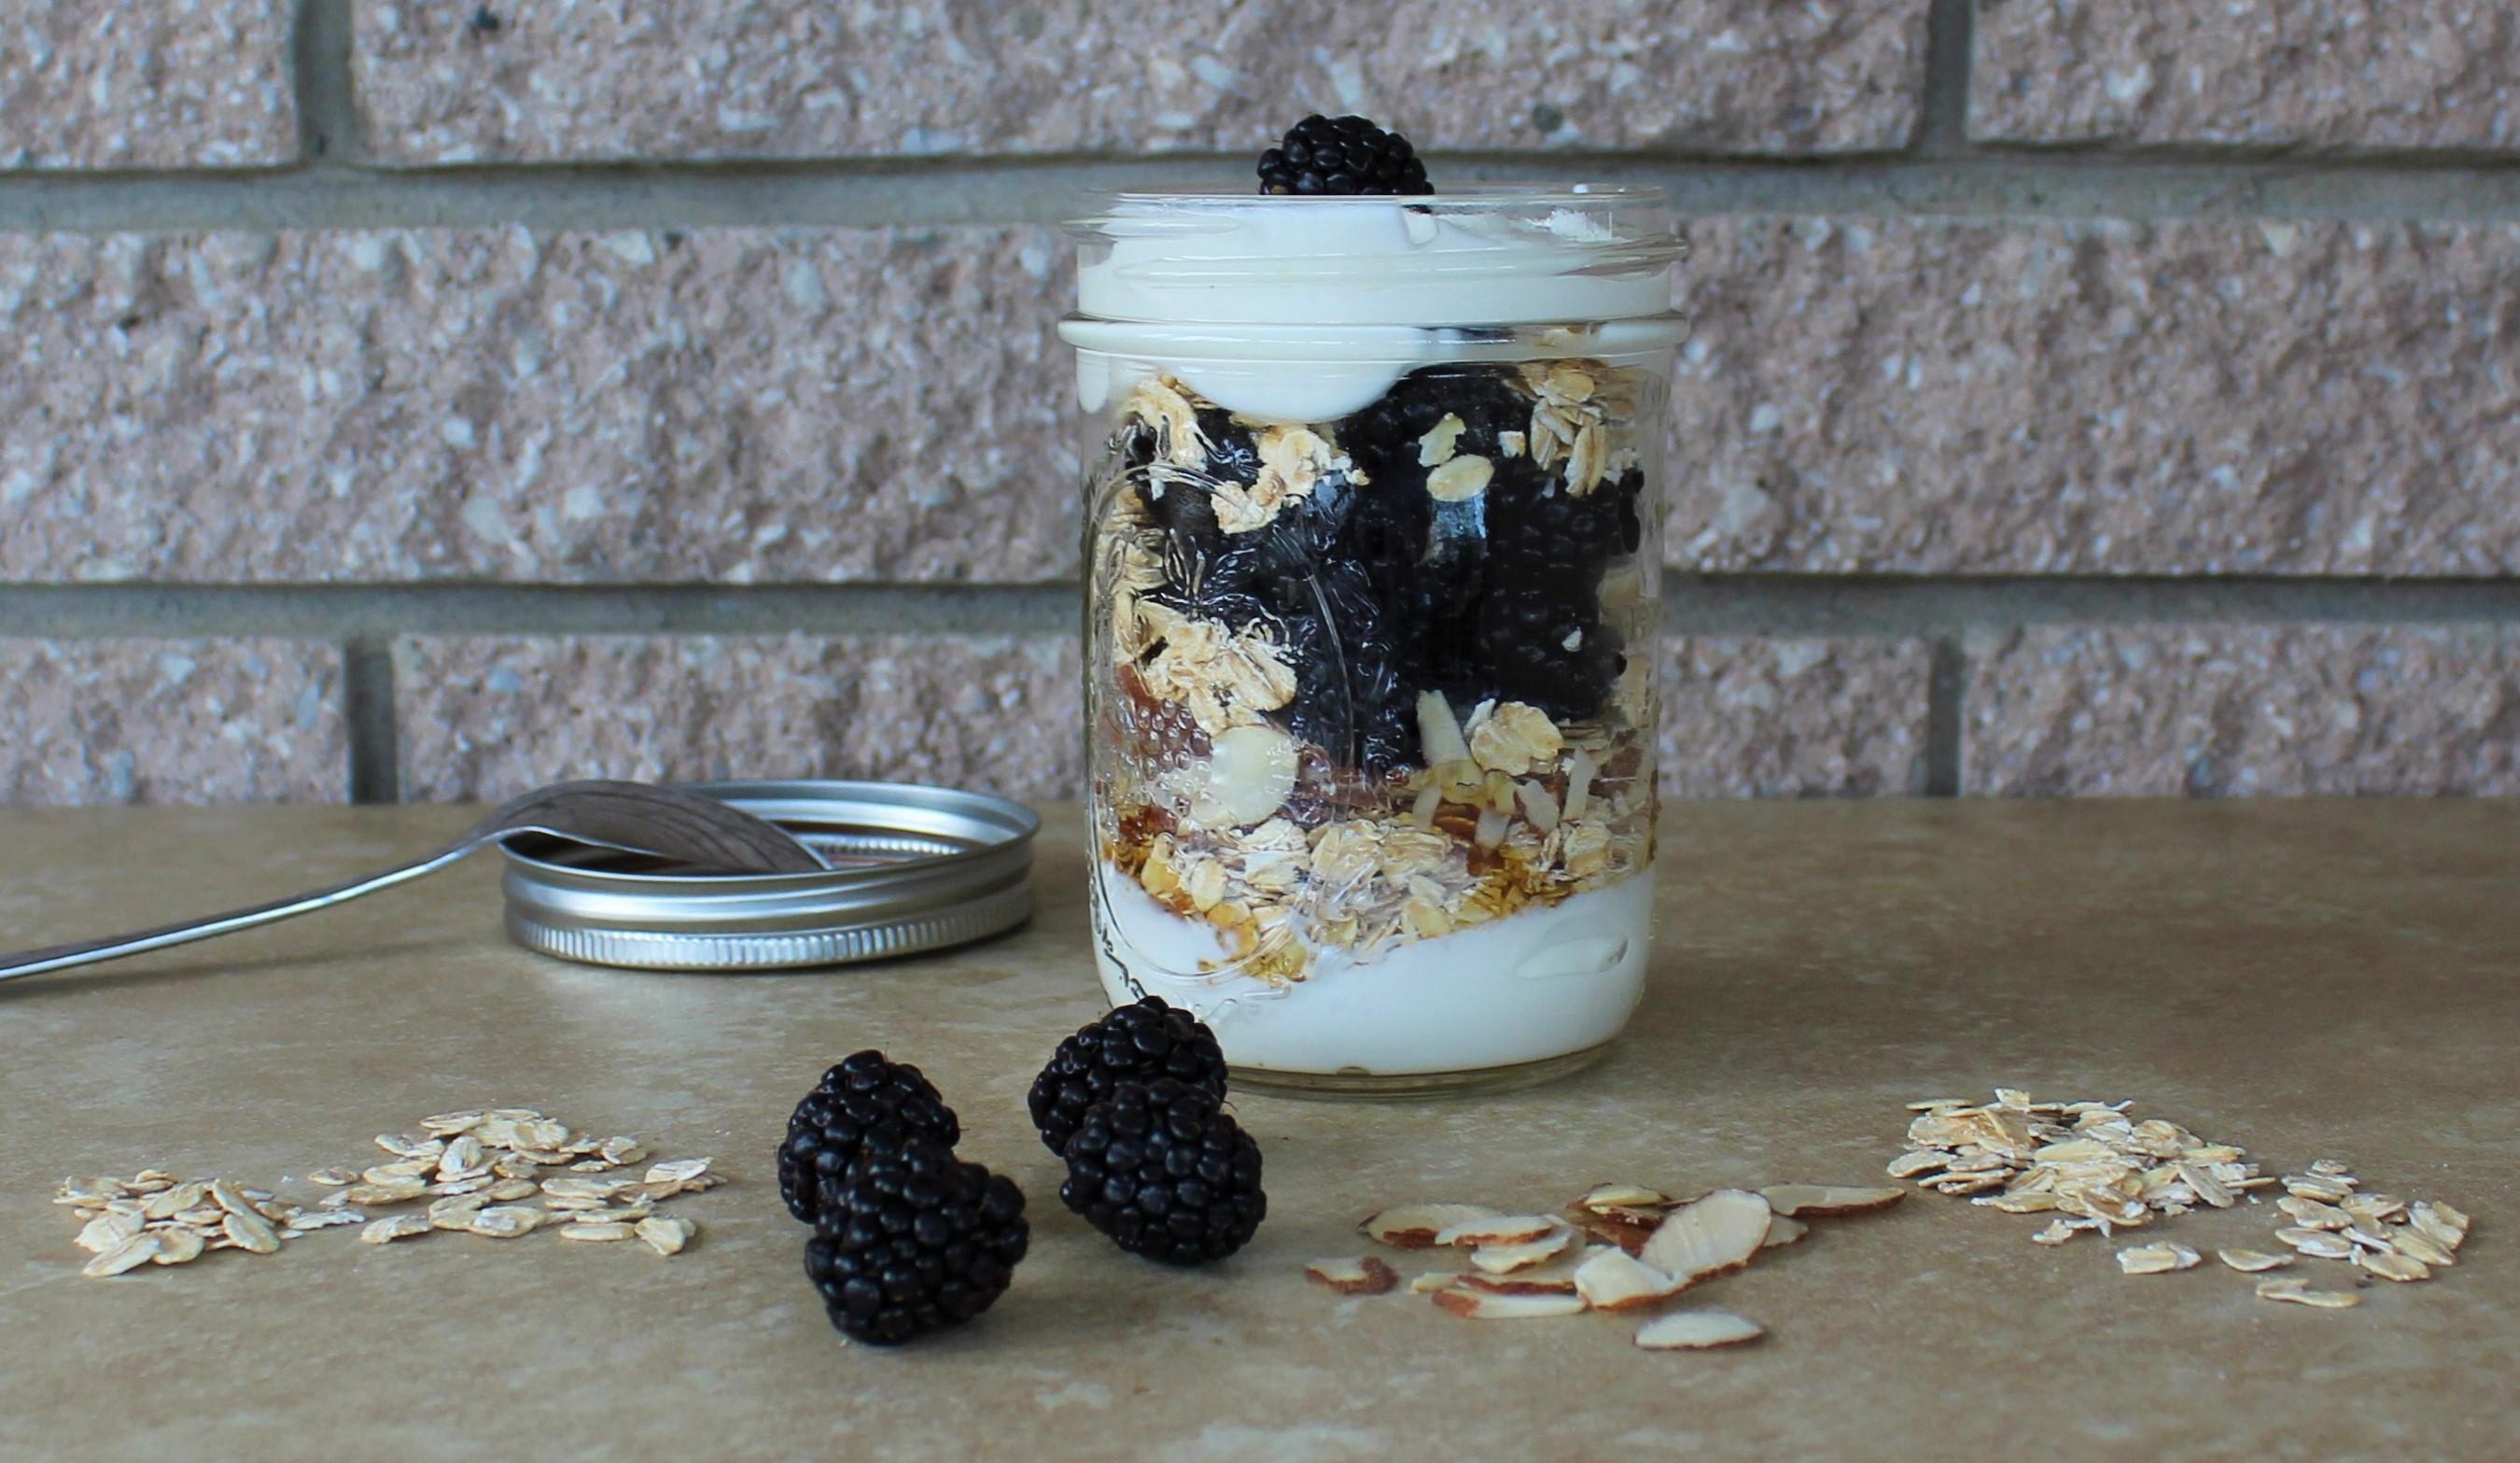 Greek Yogurt Breakfast Parfait with Blackberries, Honey and Almonds 1